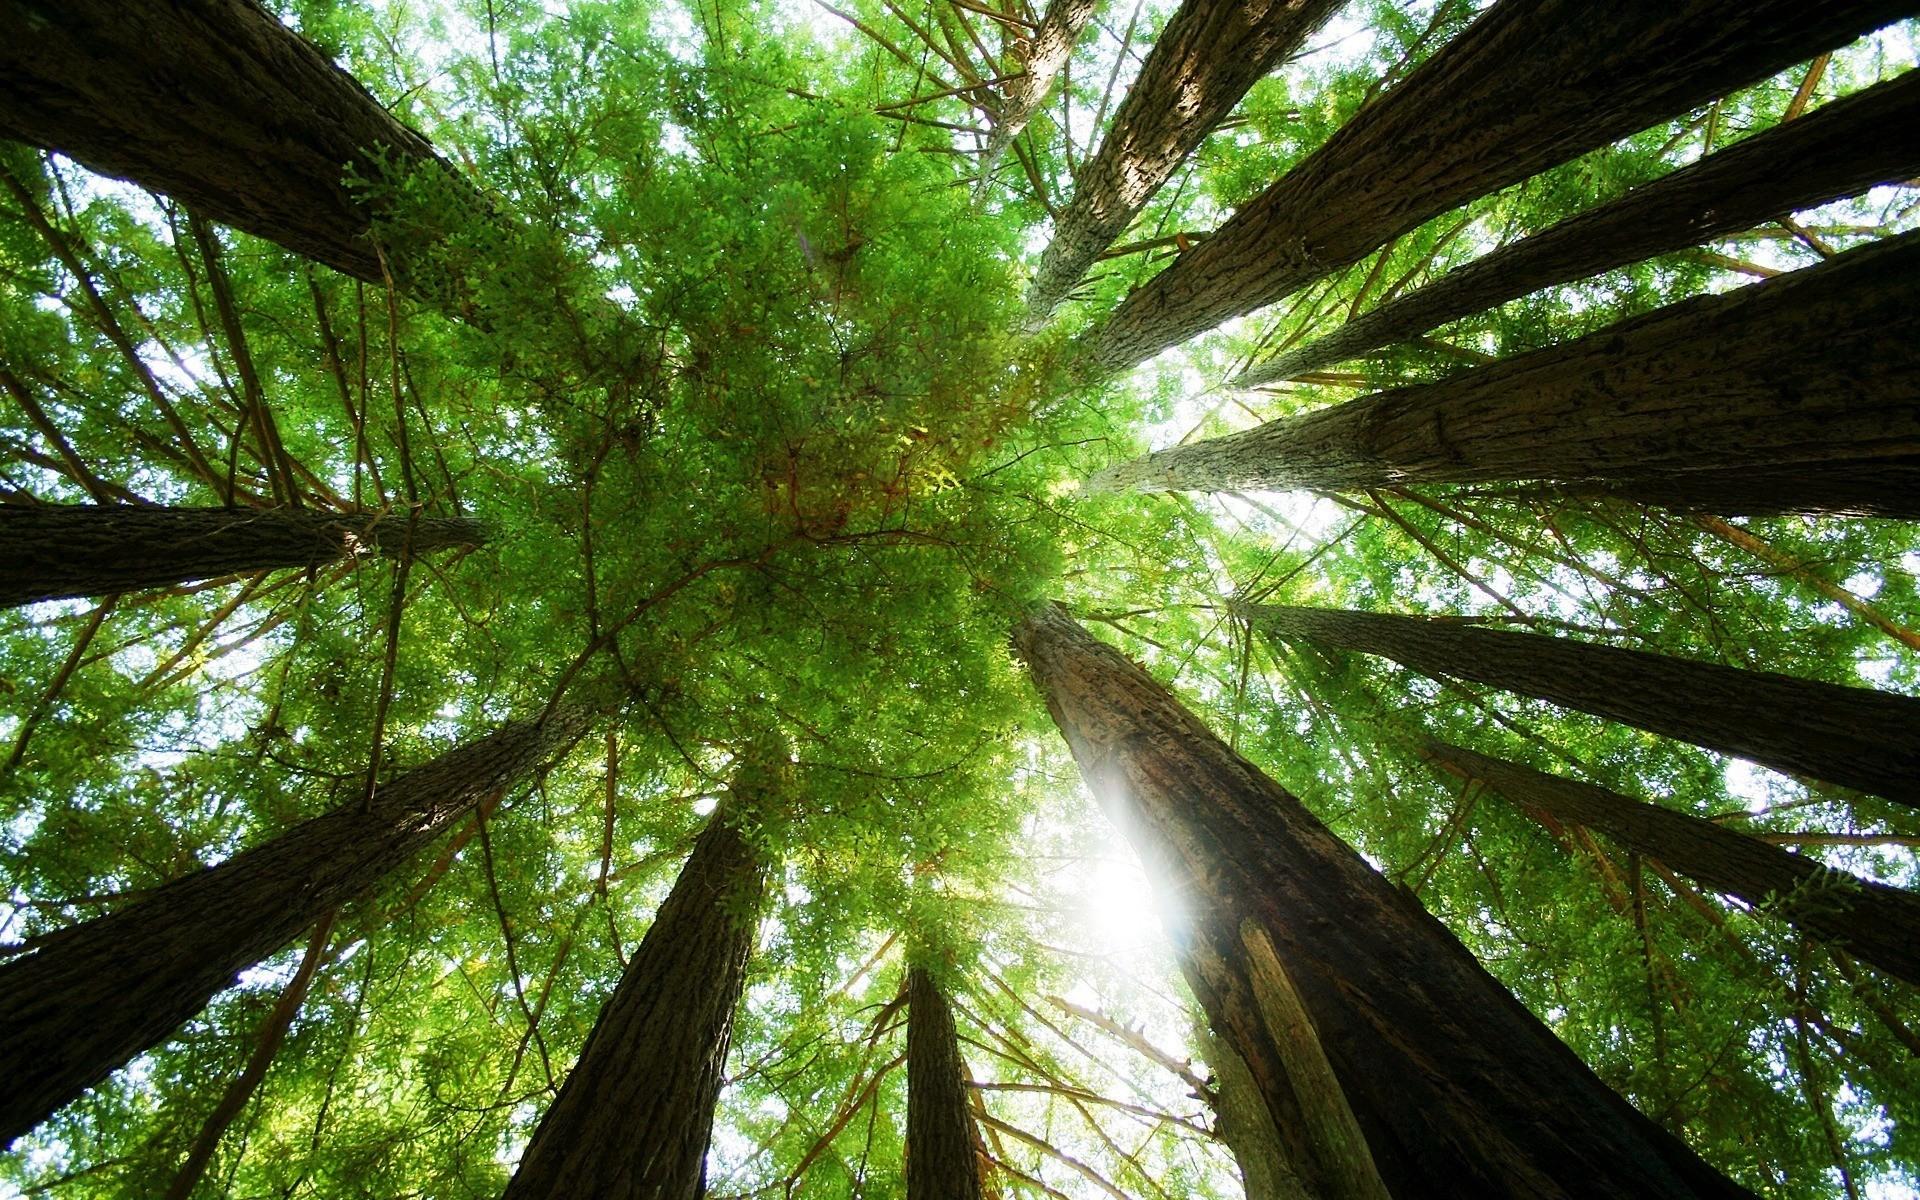 Dense Green Treetop